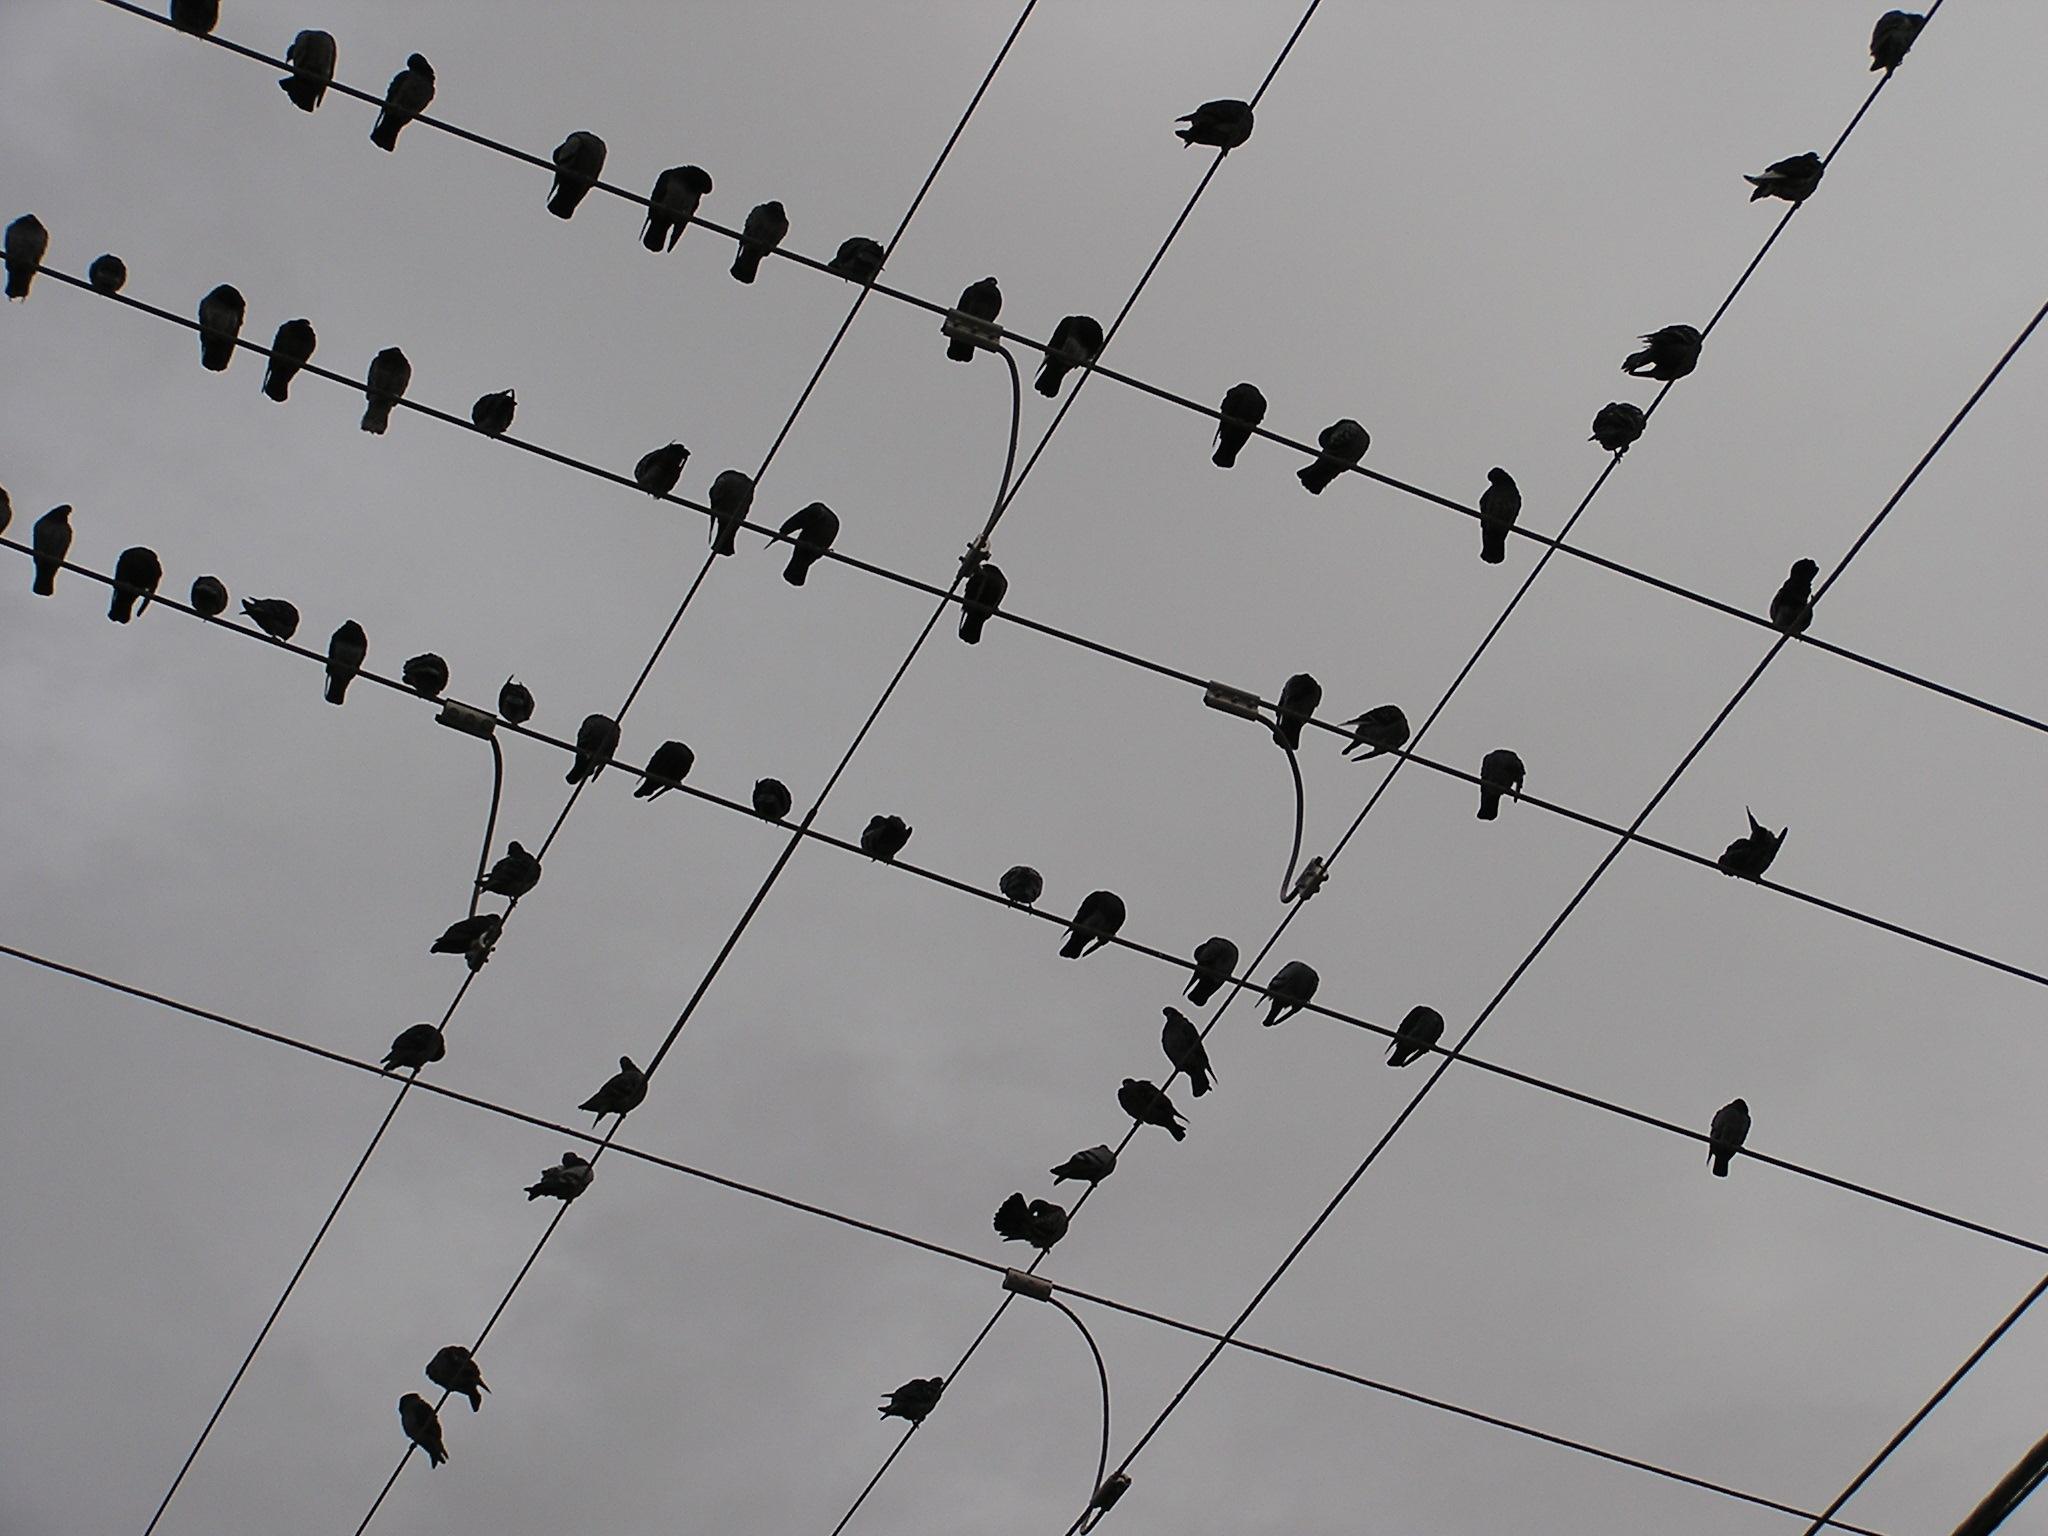 Avian Intersection by John Banks